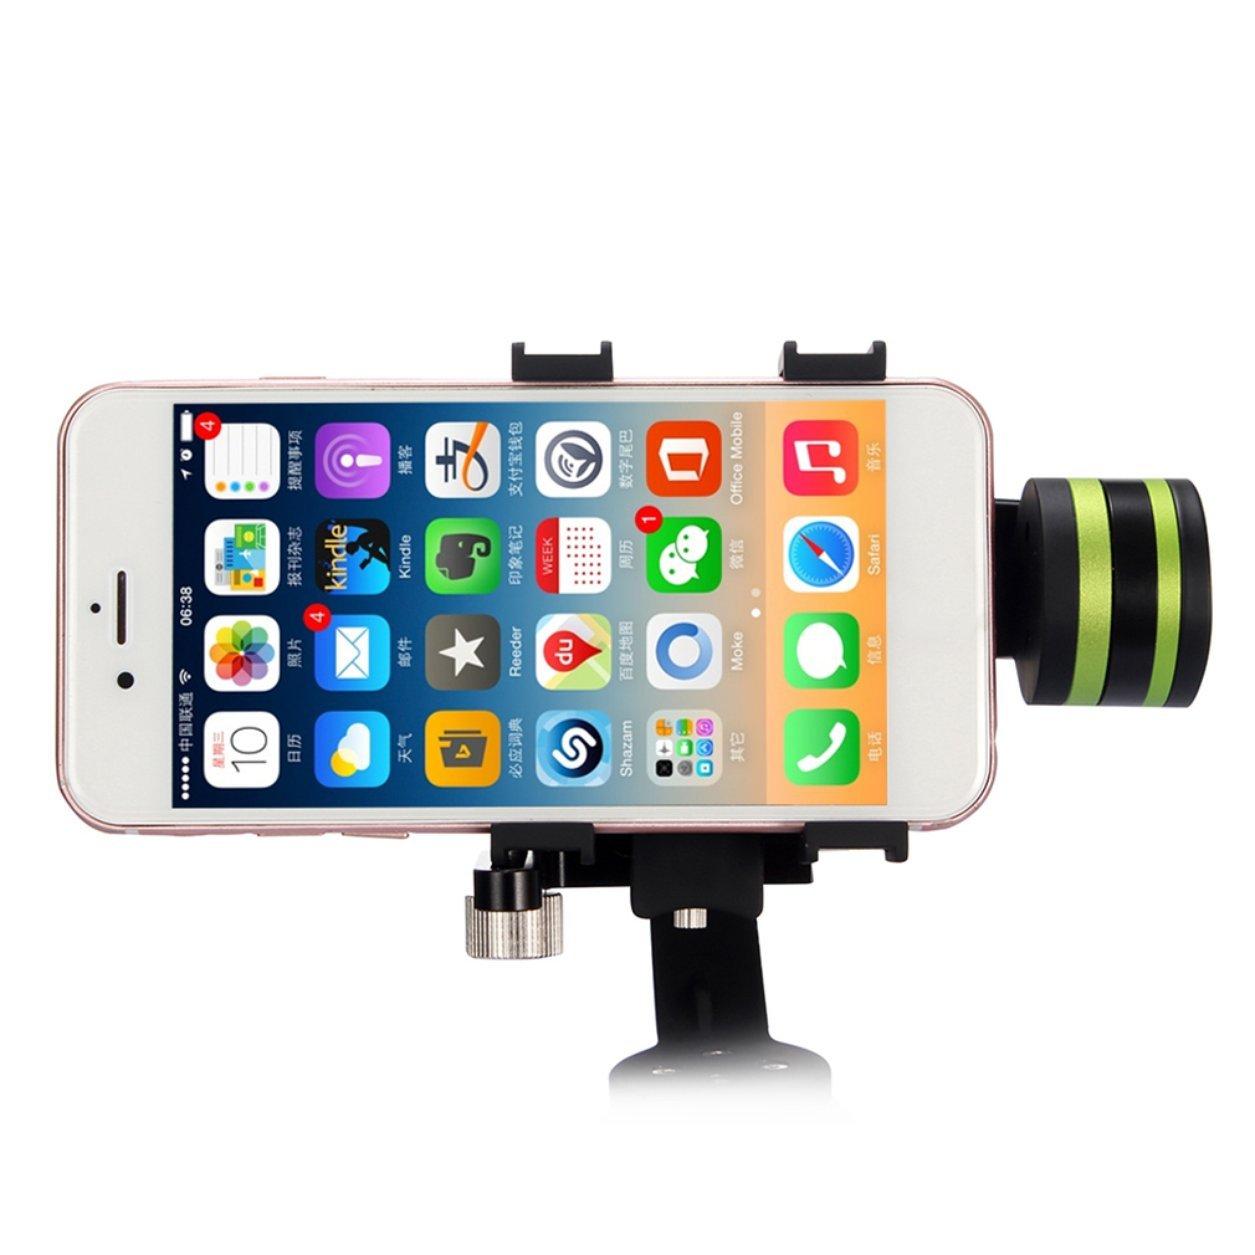 Lanparte HHG-01 3 Axis Handheld Gimbal Stabiliser for Smartphones/iPhone B07KP6T63H